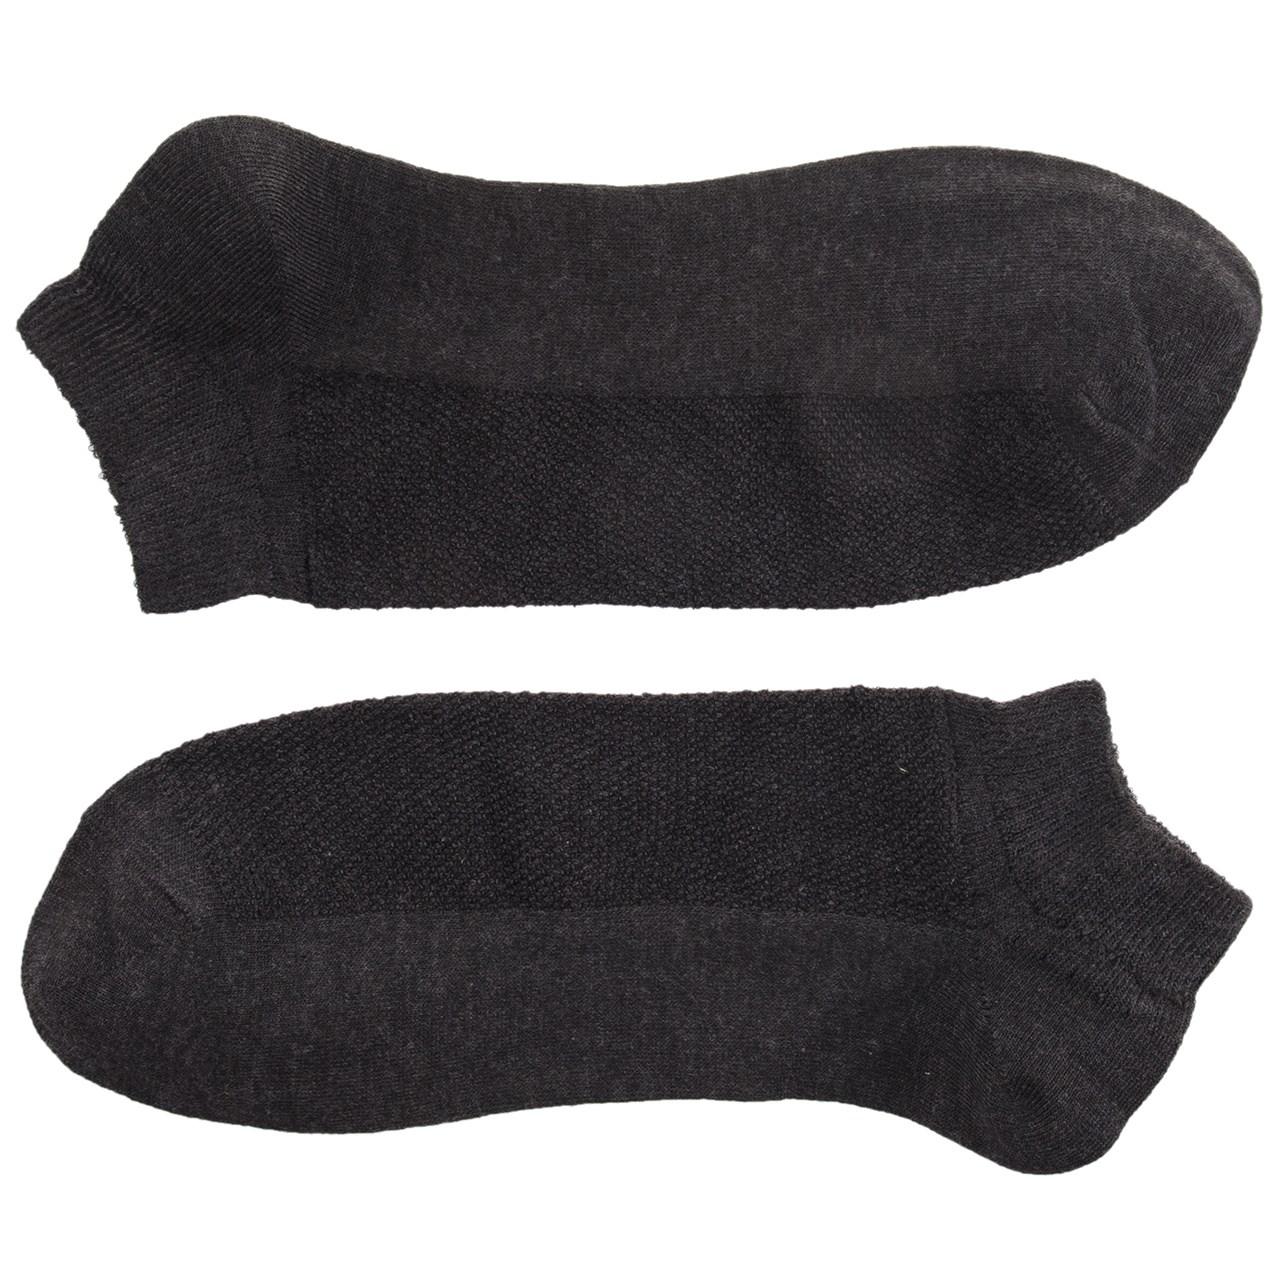 جوراب مچی مردانه پاآرا مدل 2-3-132